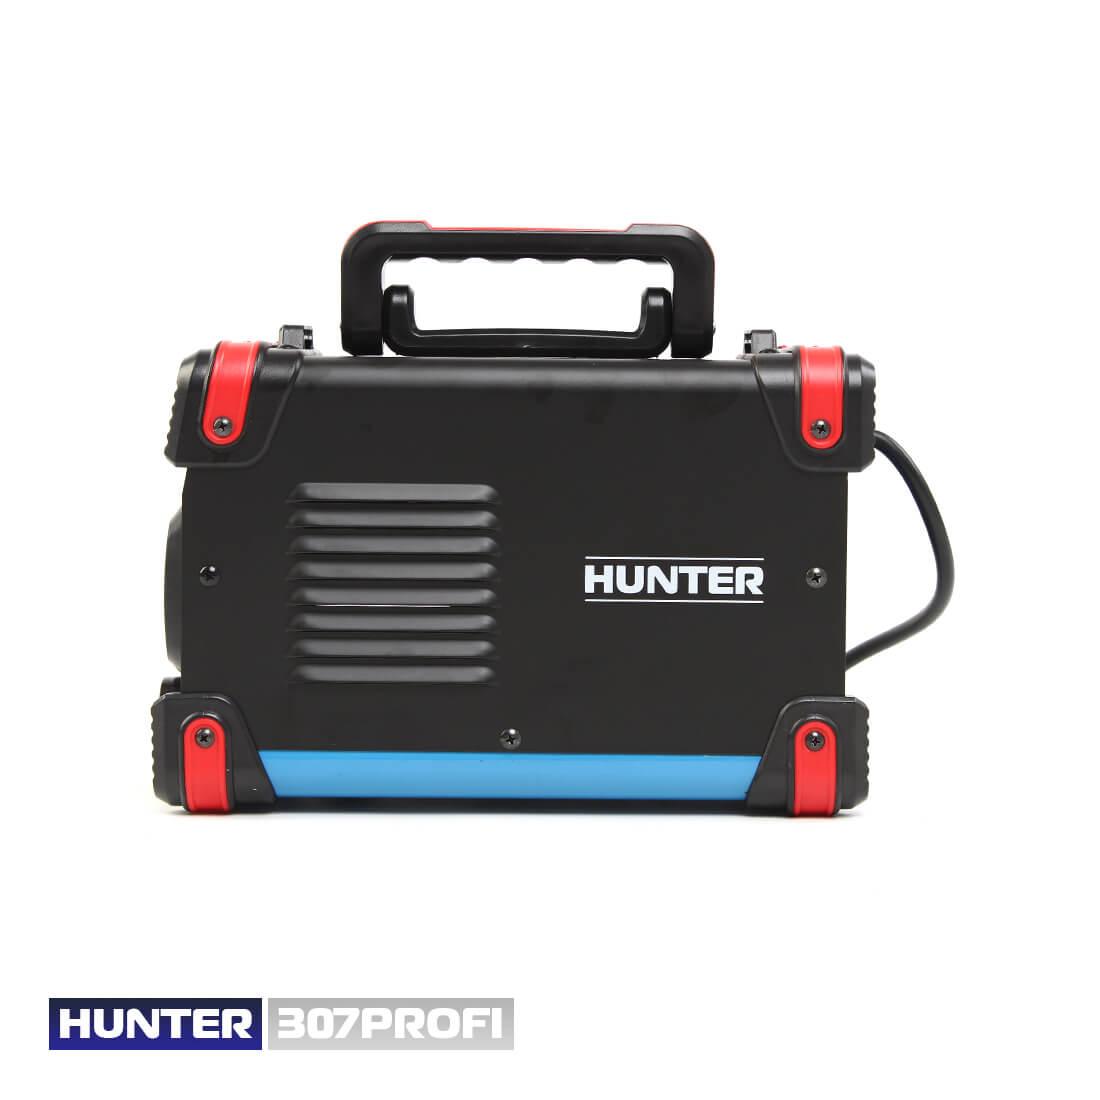 Фото Hunter MMA 307 PROFI (дуговая) цена 3150грн №4 — Hunter